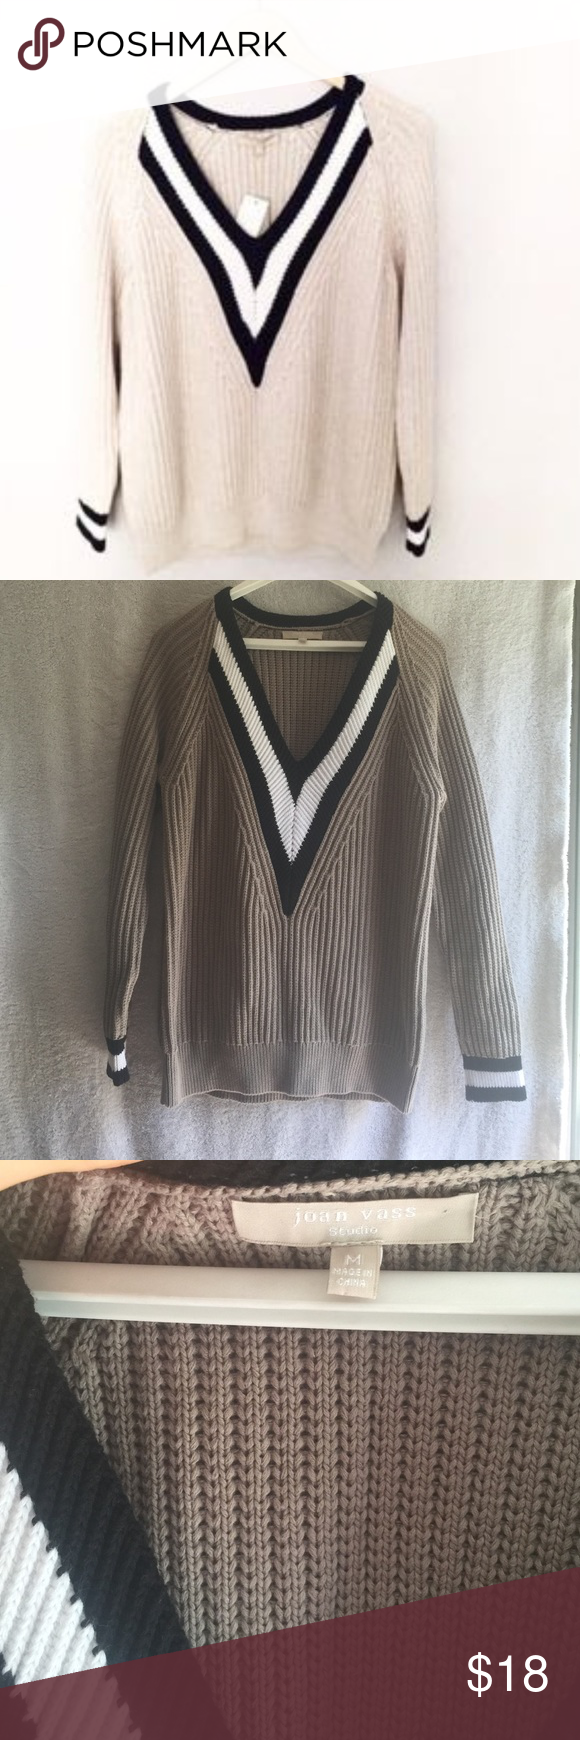 Unreal JOAN VASS STUDIO SWEATER Such great style! Joan vass Sweaters V-Necks